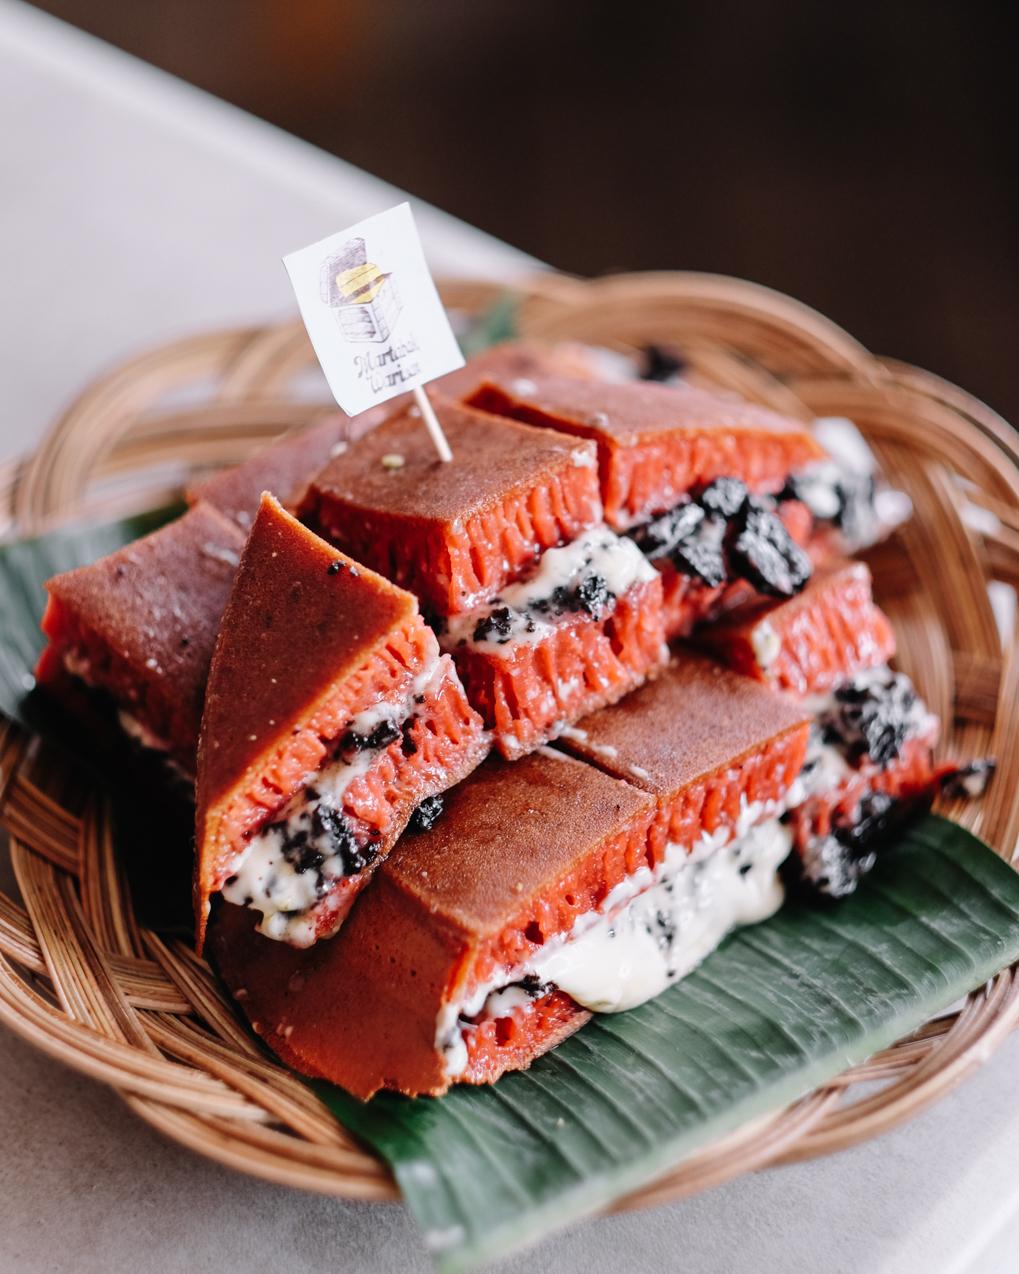 MARTABAK WARISAN T.B. SIMATUPANG JAKARTA - eatandtreats - Indonesian Food and Travel Blogger ...